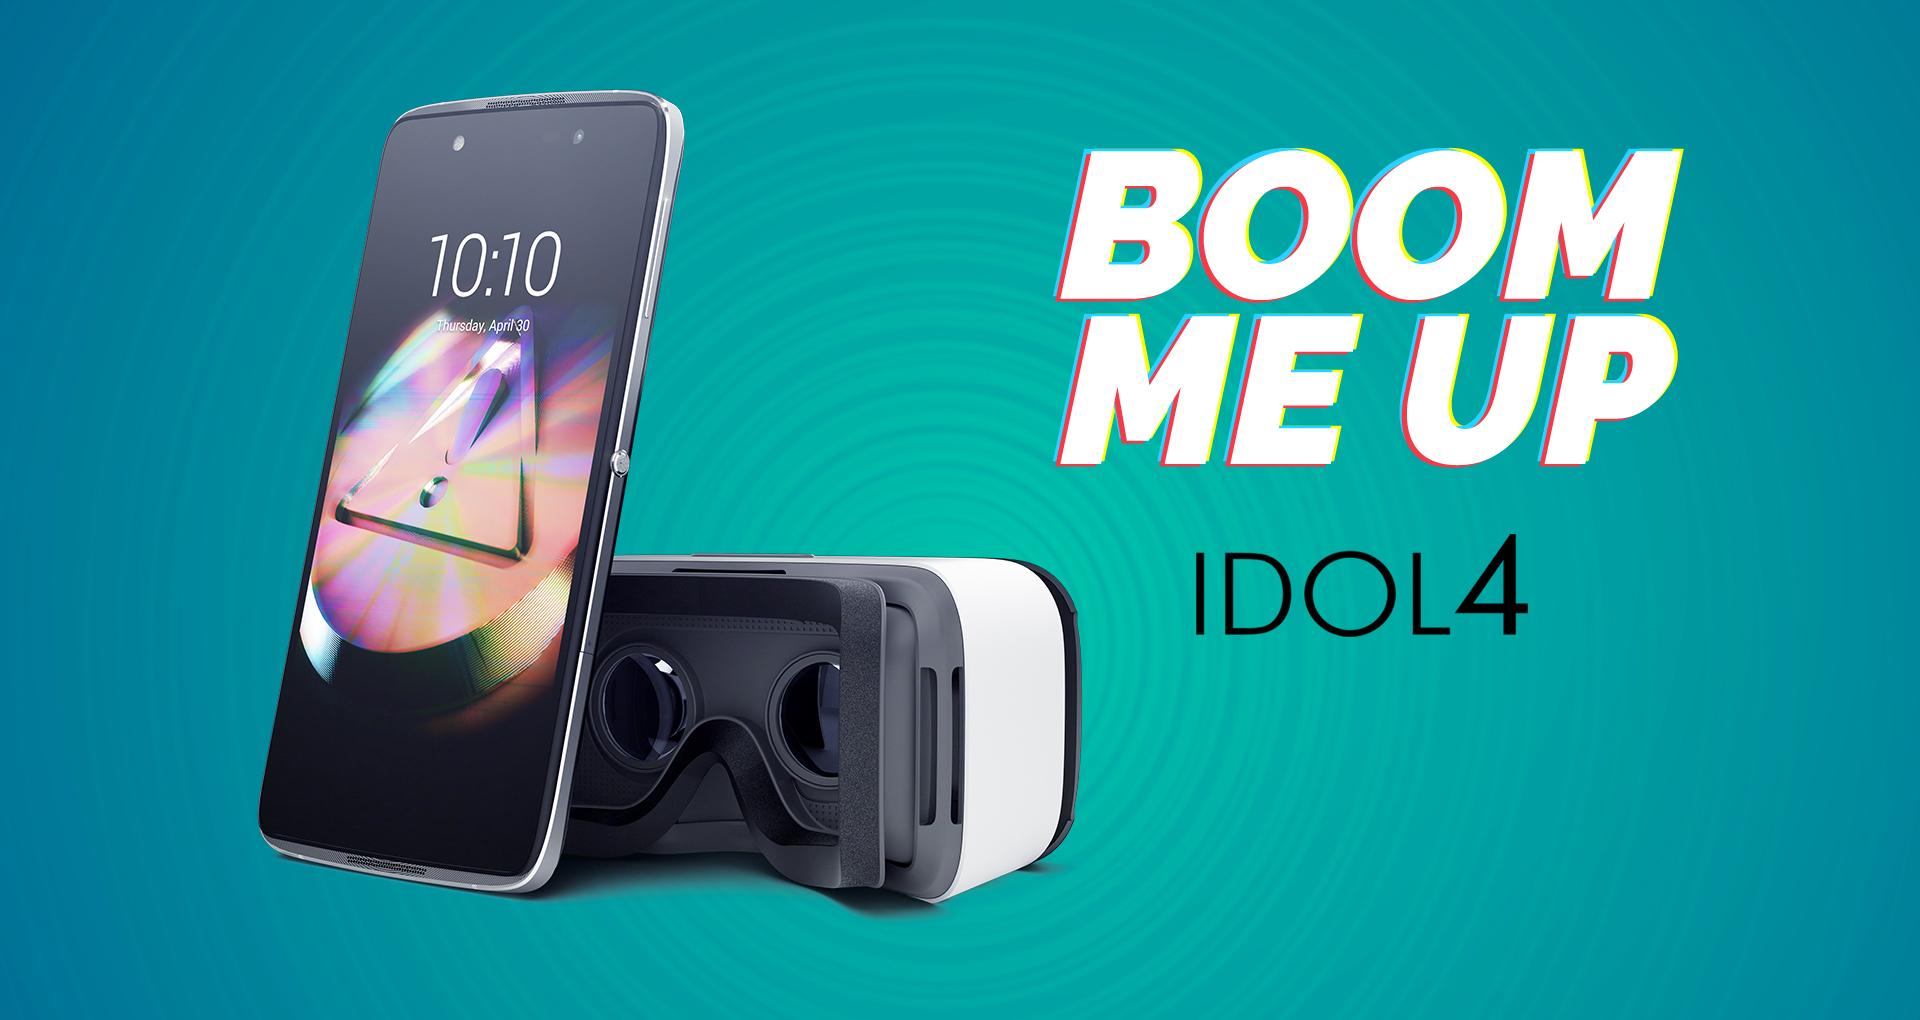 Alcatel mobile | Australia - IDOL4 - Smartphones